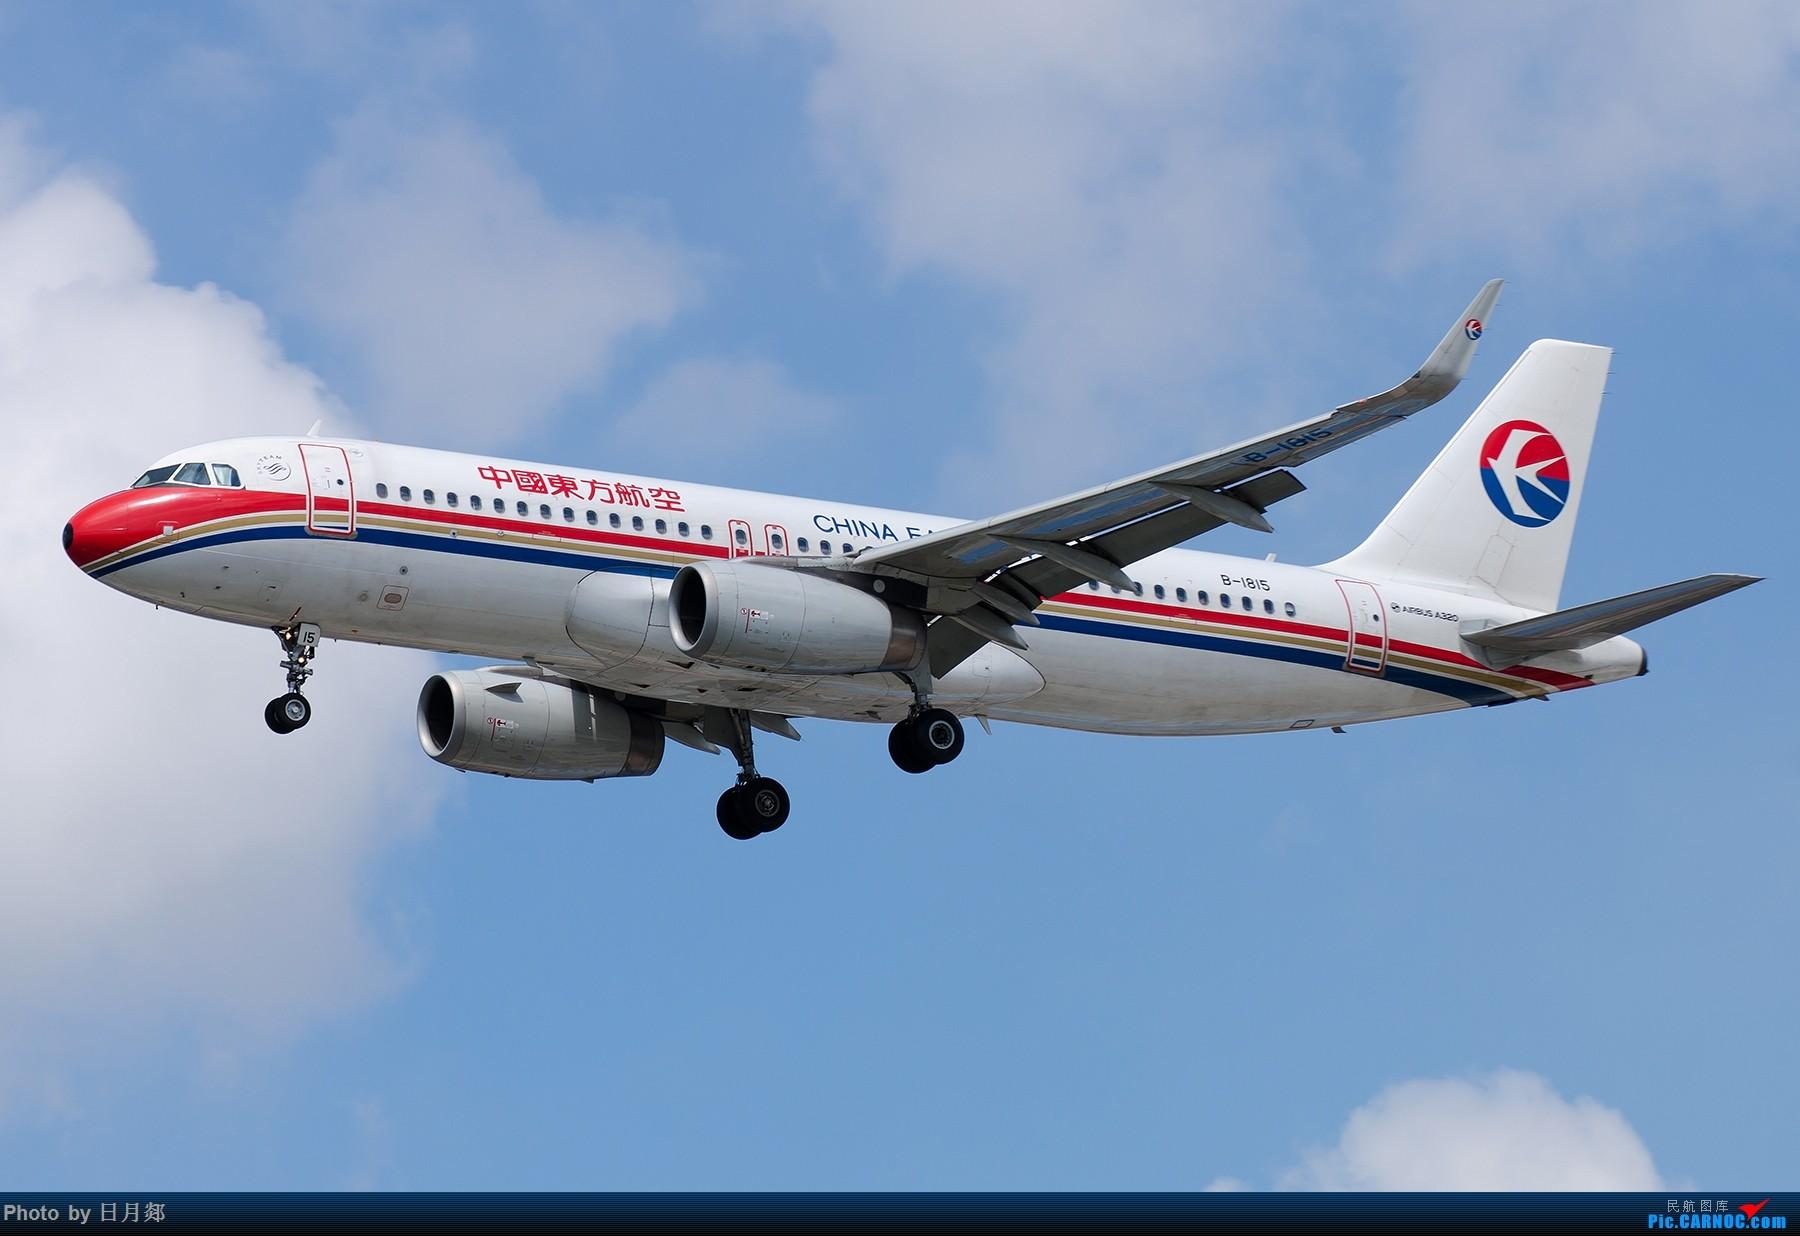 Re:[原创]【SHA拍机*1800大图】图要抓紧发,不然就要炒冷饭,大头镇贴 AIRBUS A320-200 B-1815 中国上海虹桥国际机场